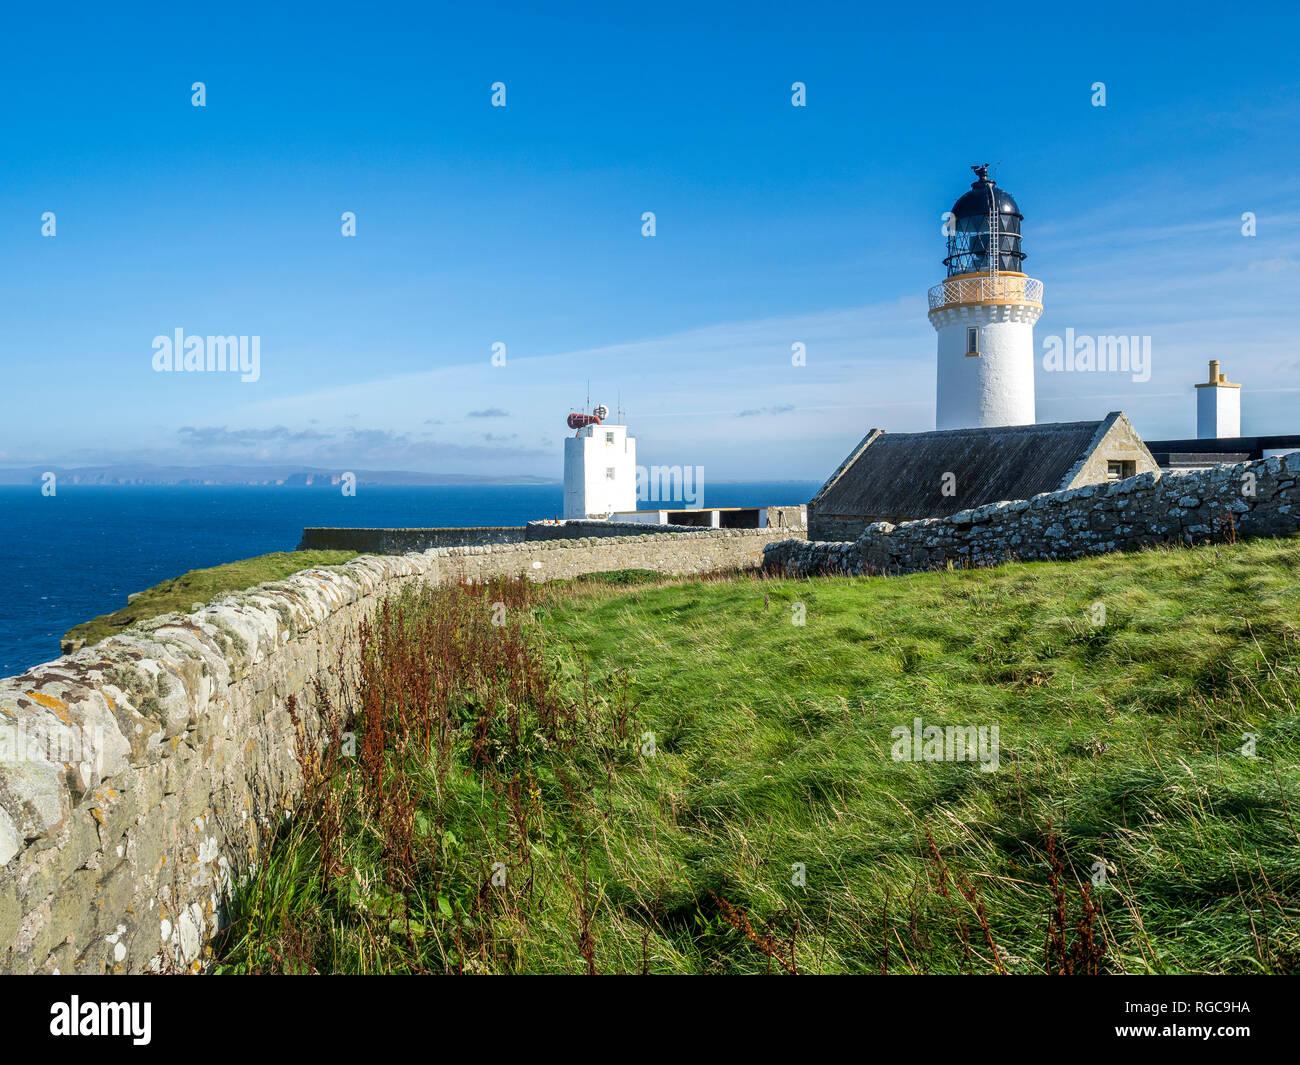 UK, Scotland, Highland, Southland, Dunnet Head lighthouse - Stock Image